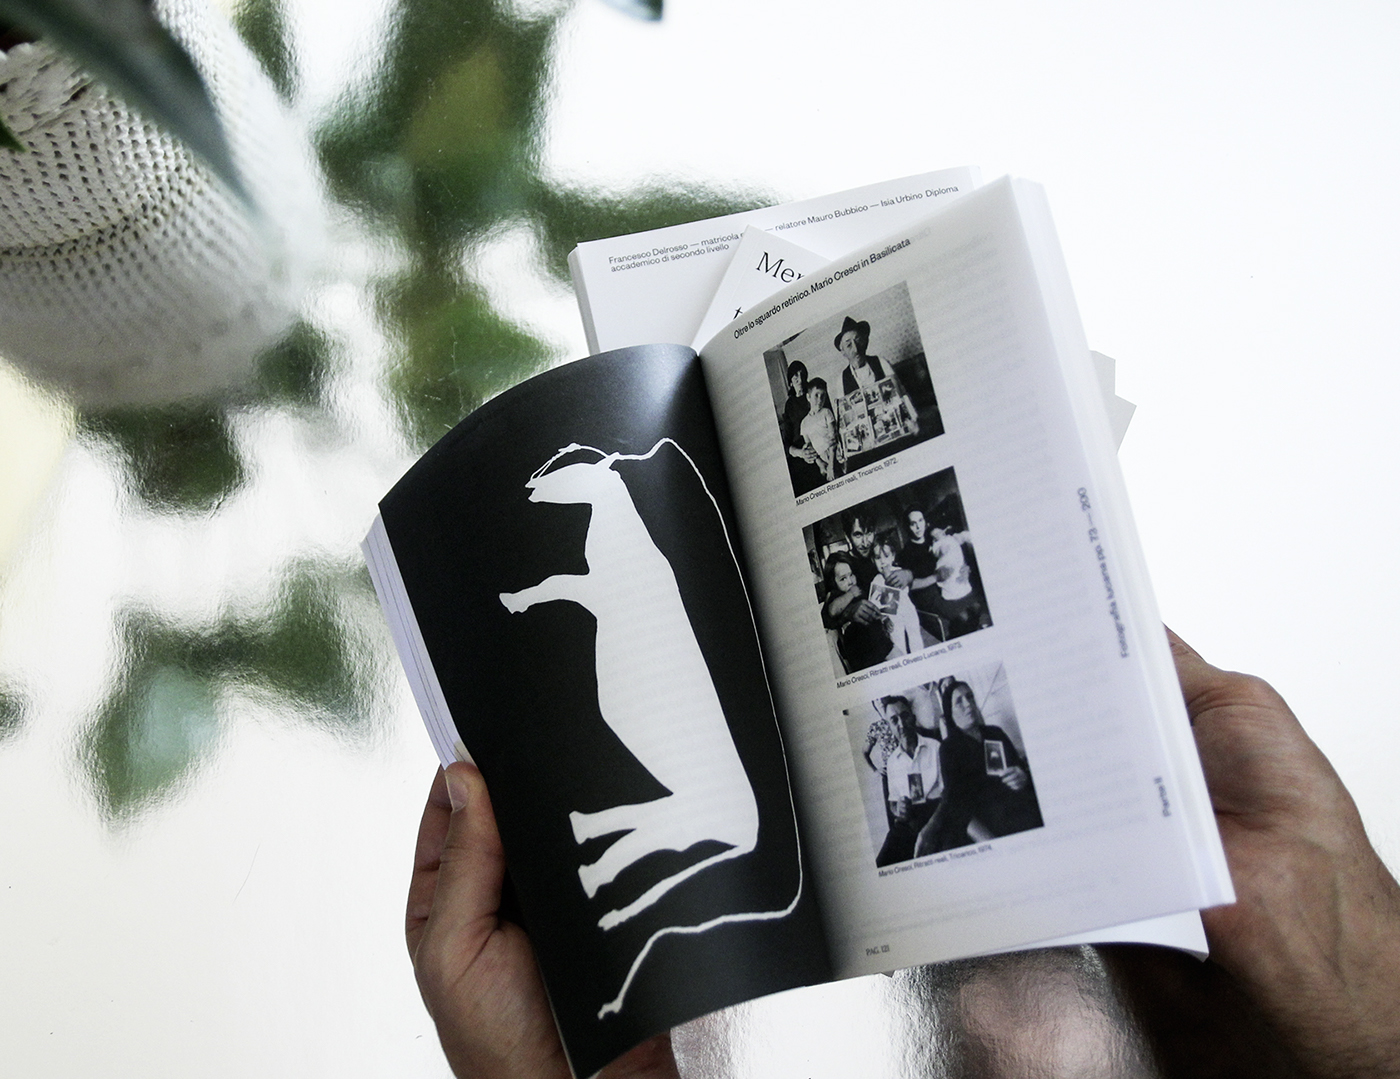 research book editorial basilicata lucania IsiaUrbino territory memories identity southitaly south